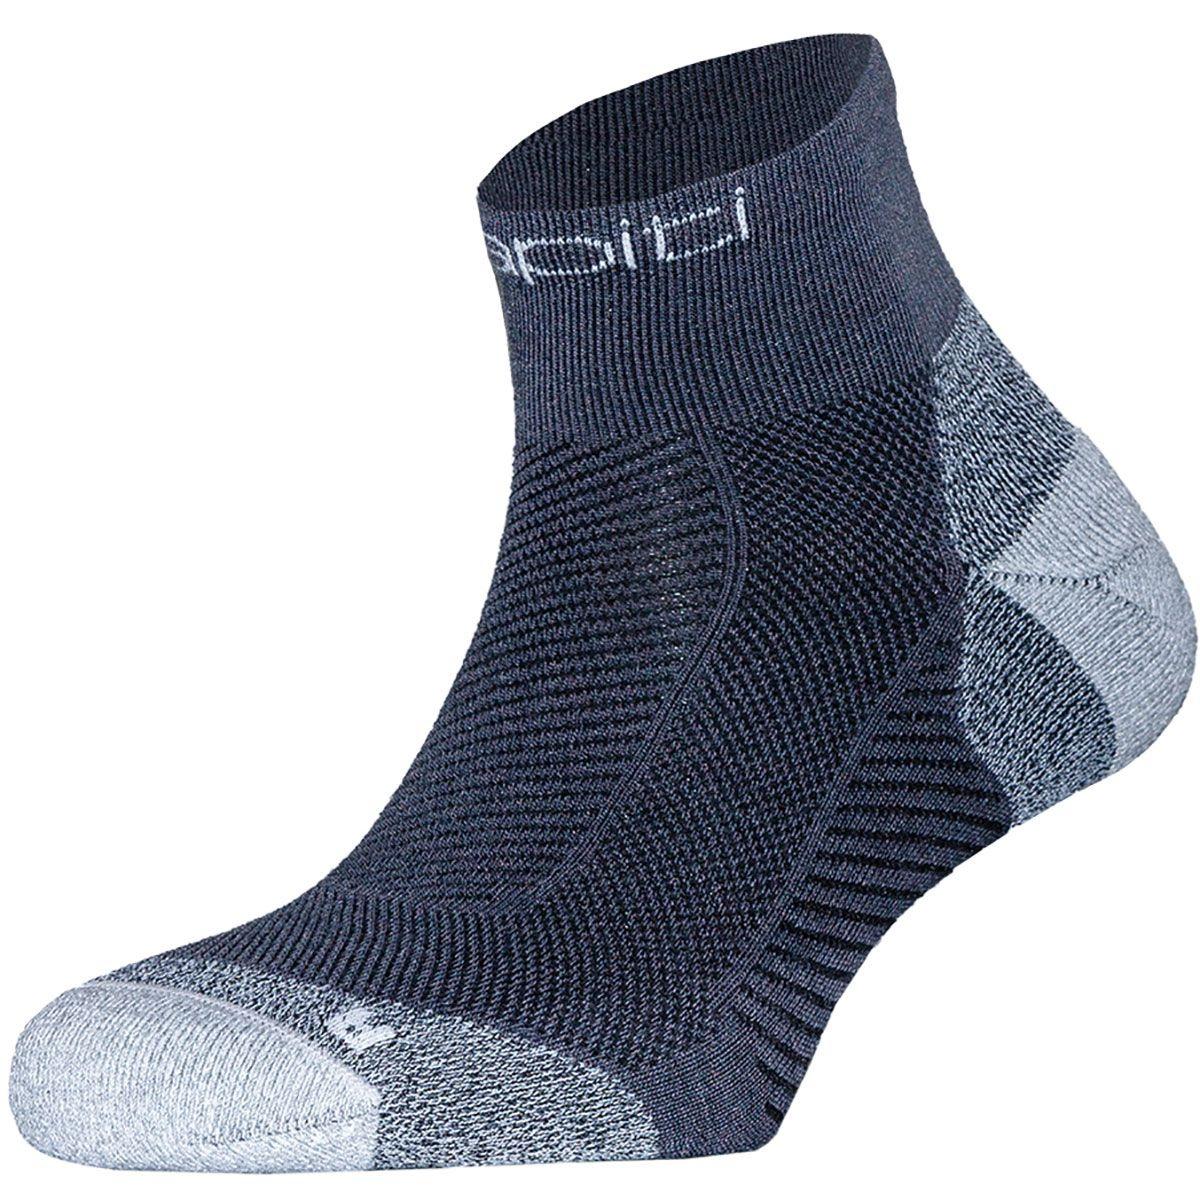 WAPITI Sneaker Socken Mückenschutz mit Merinowolle Unisex